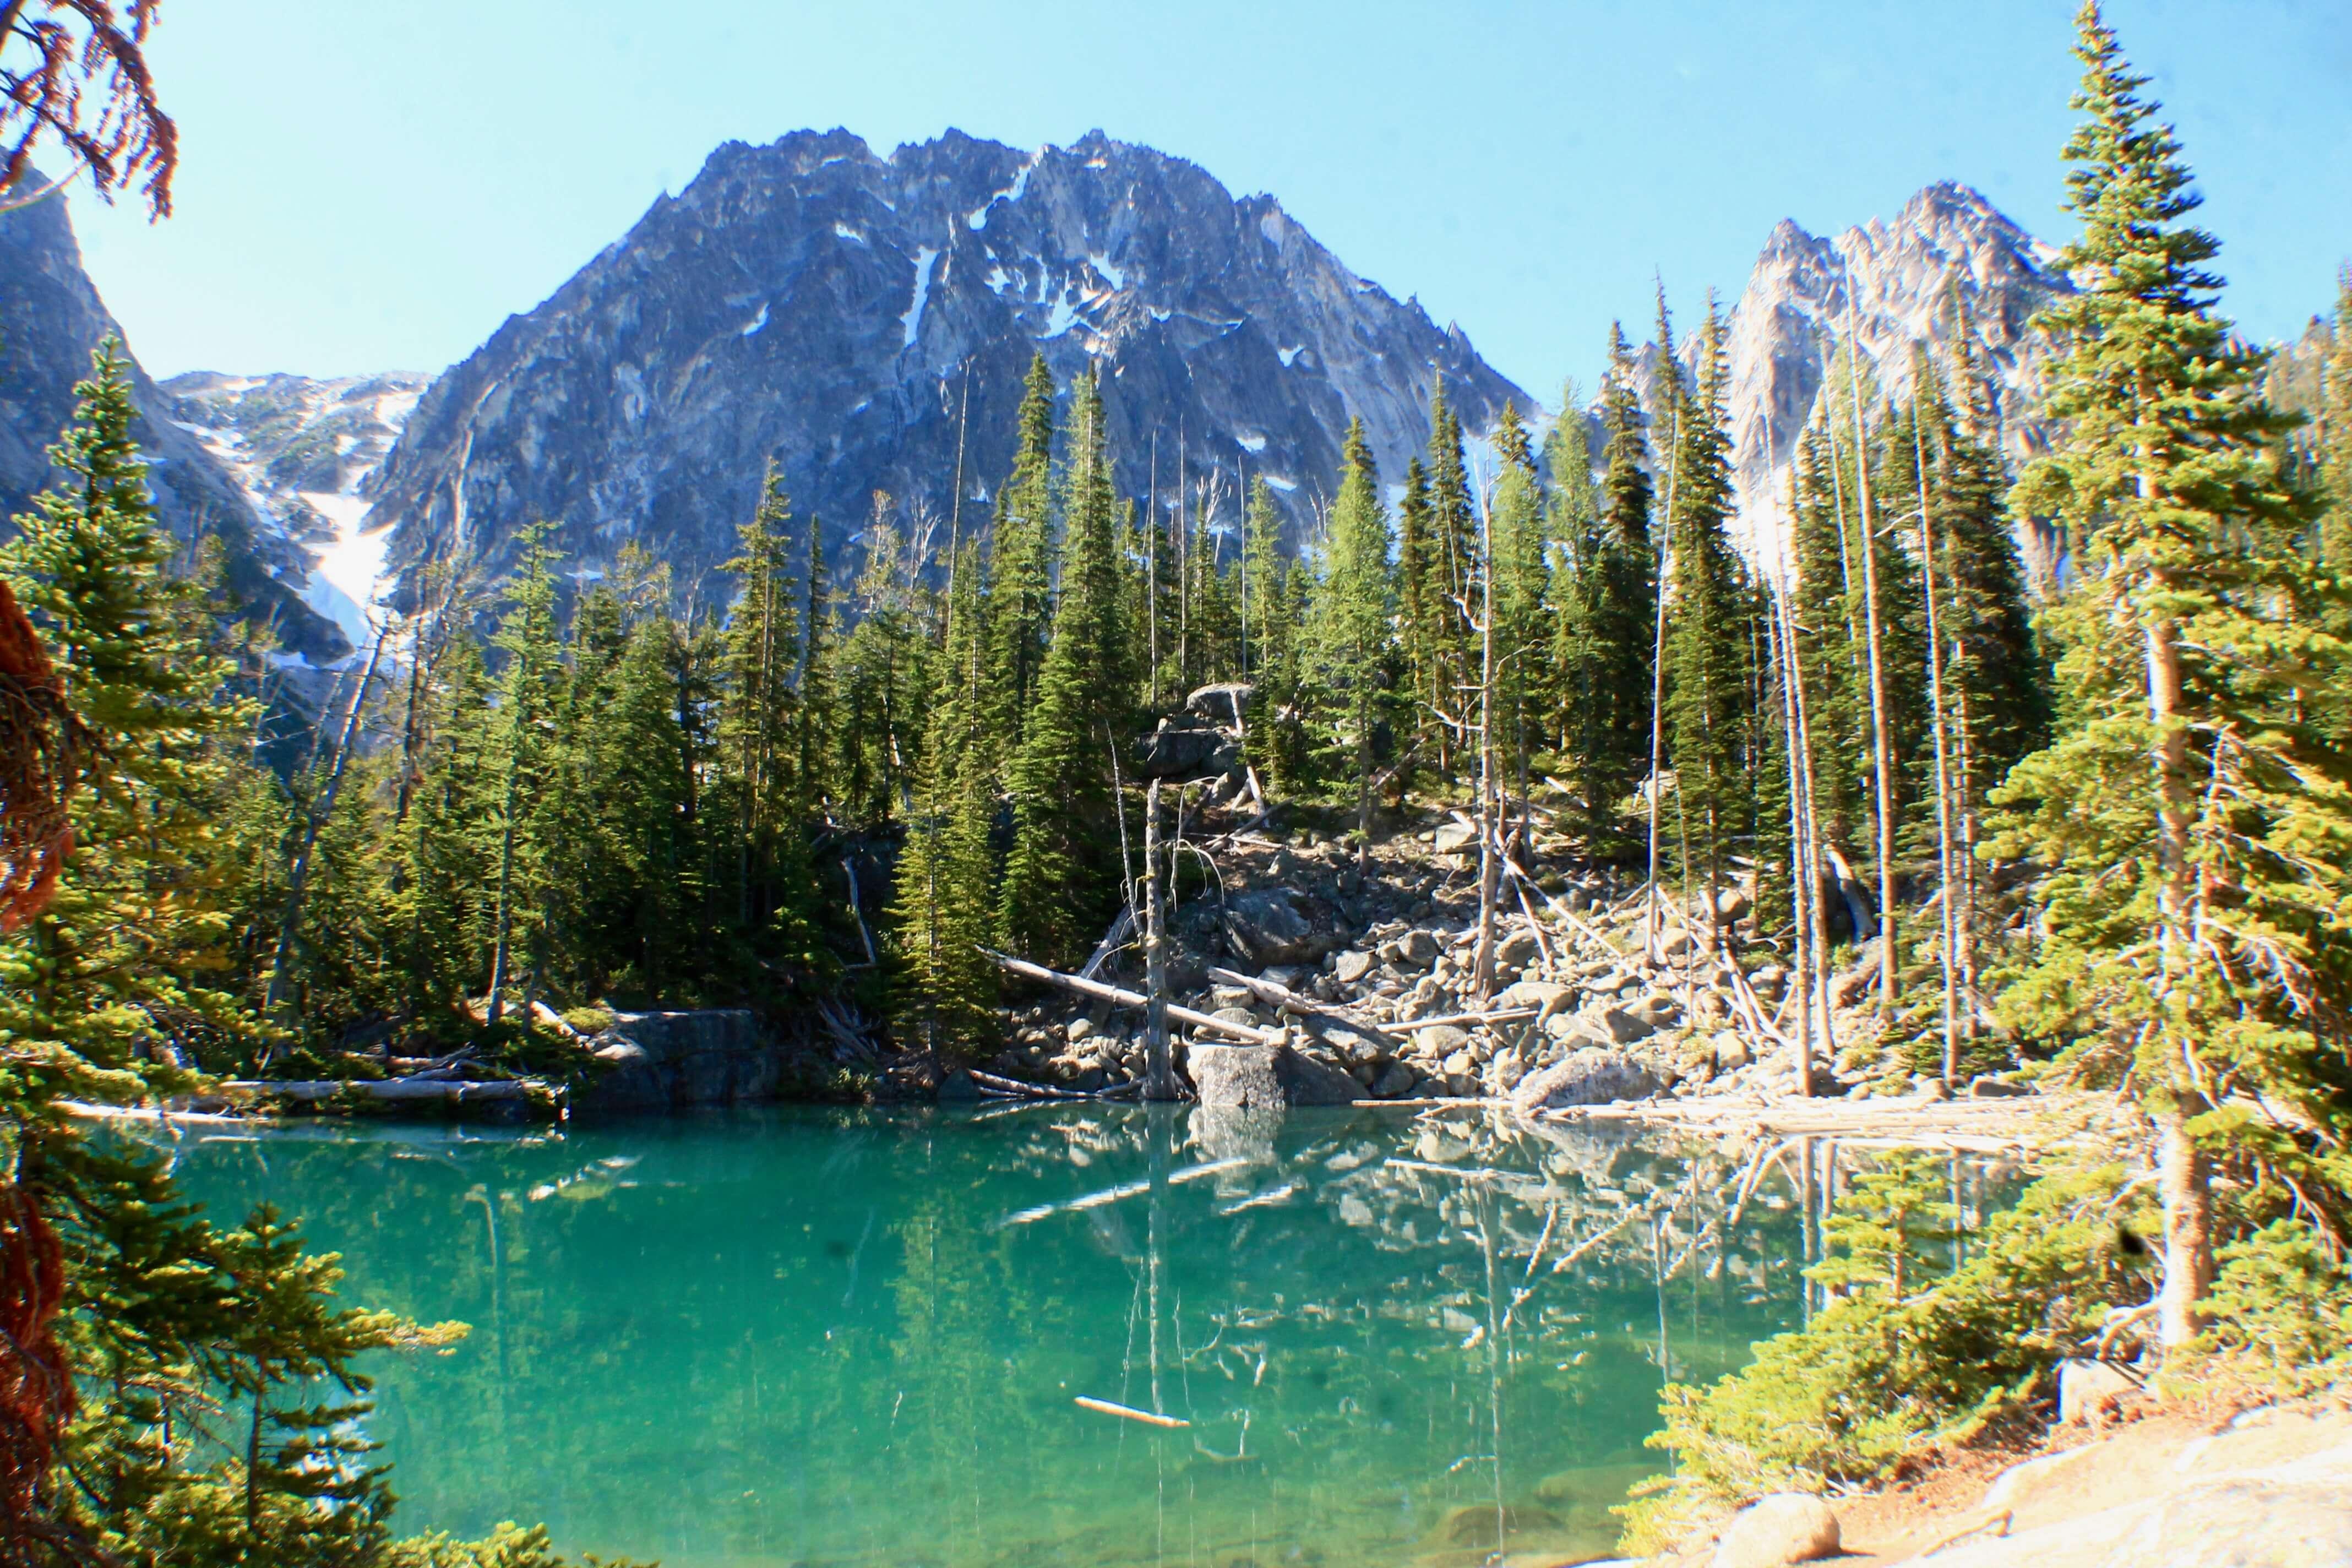 Colchuck lake, Hiking the Enchantments